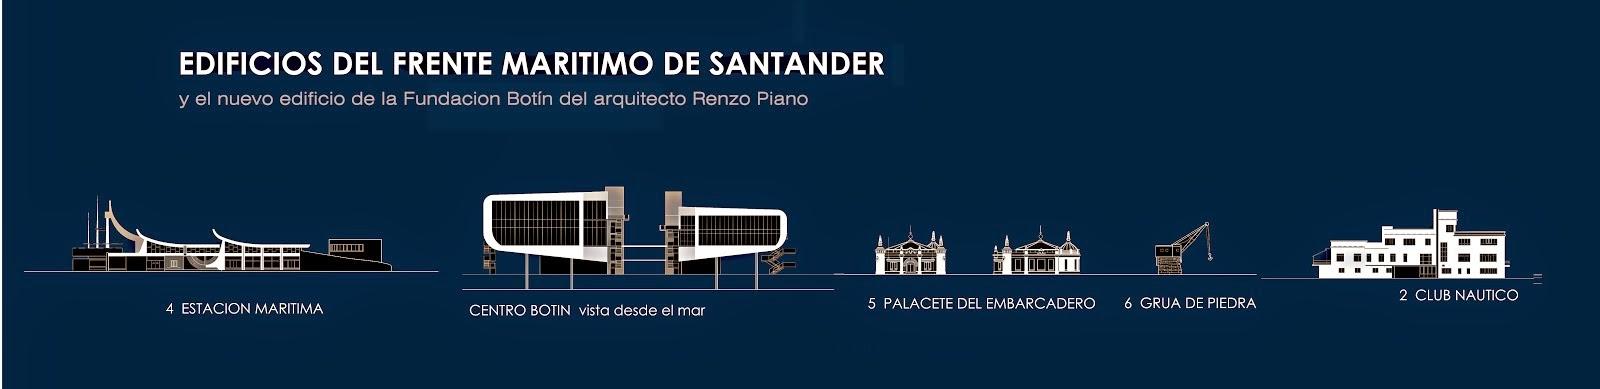 taza con frente maritimo de Santander